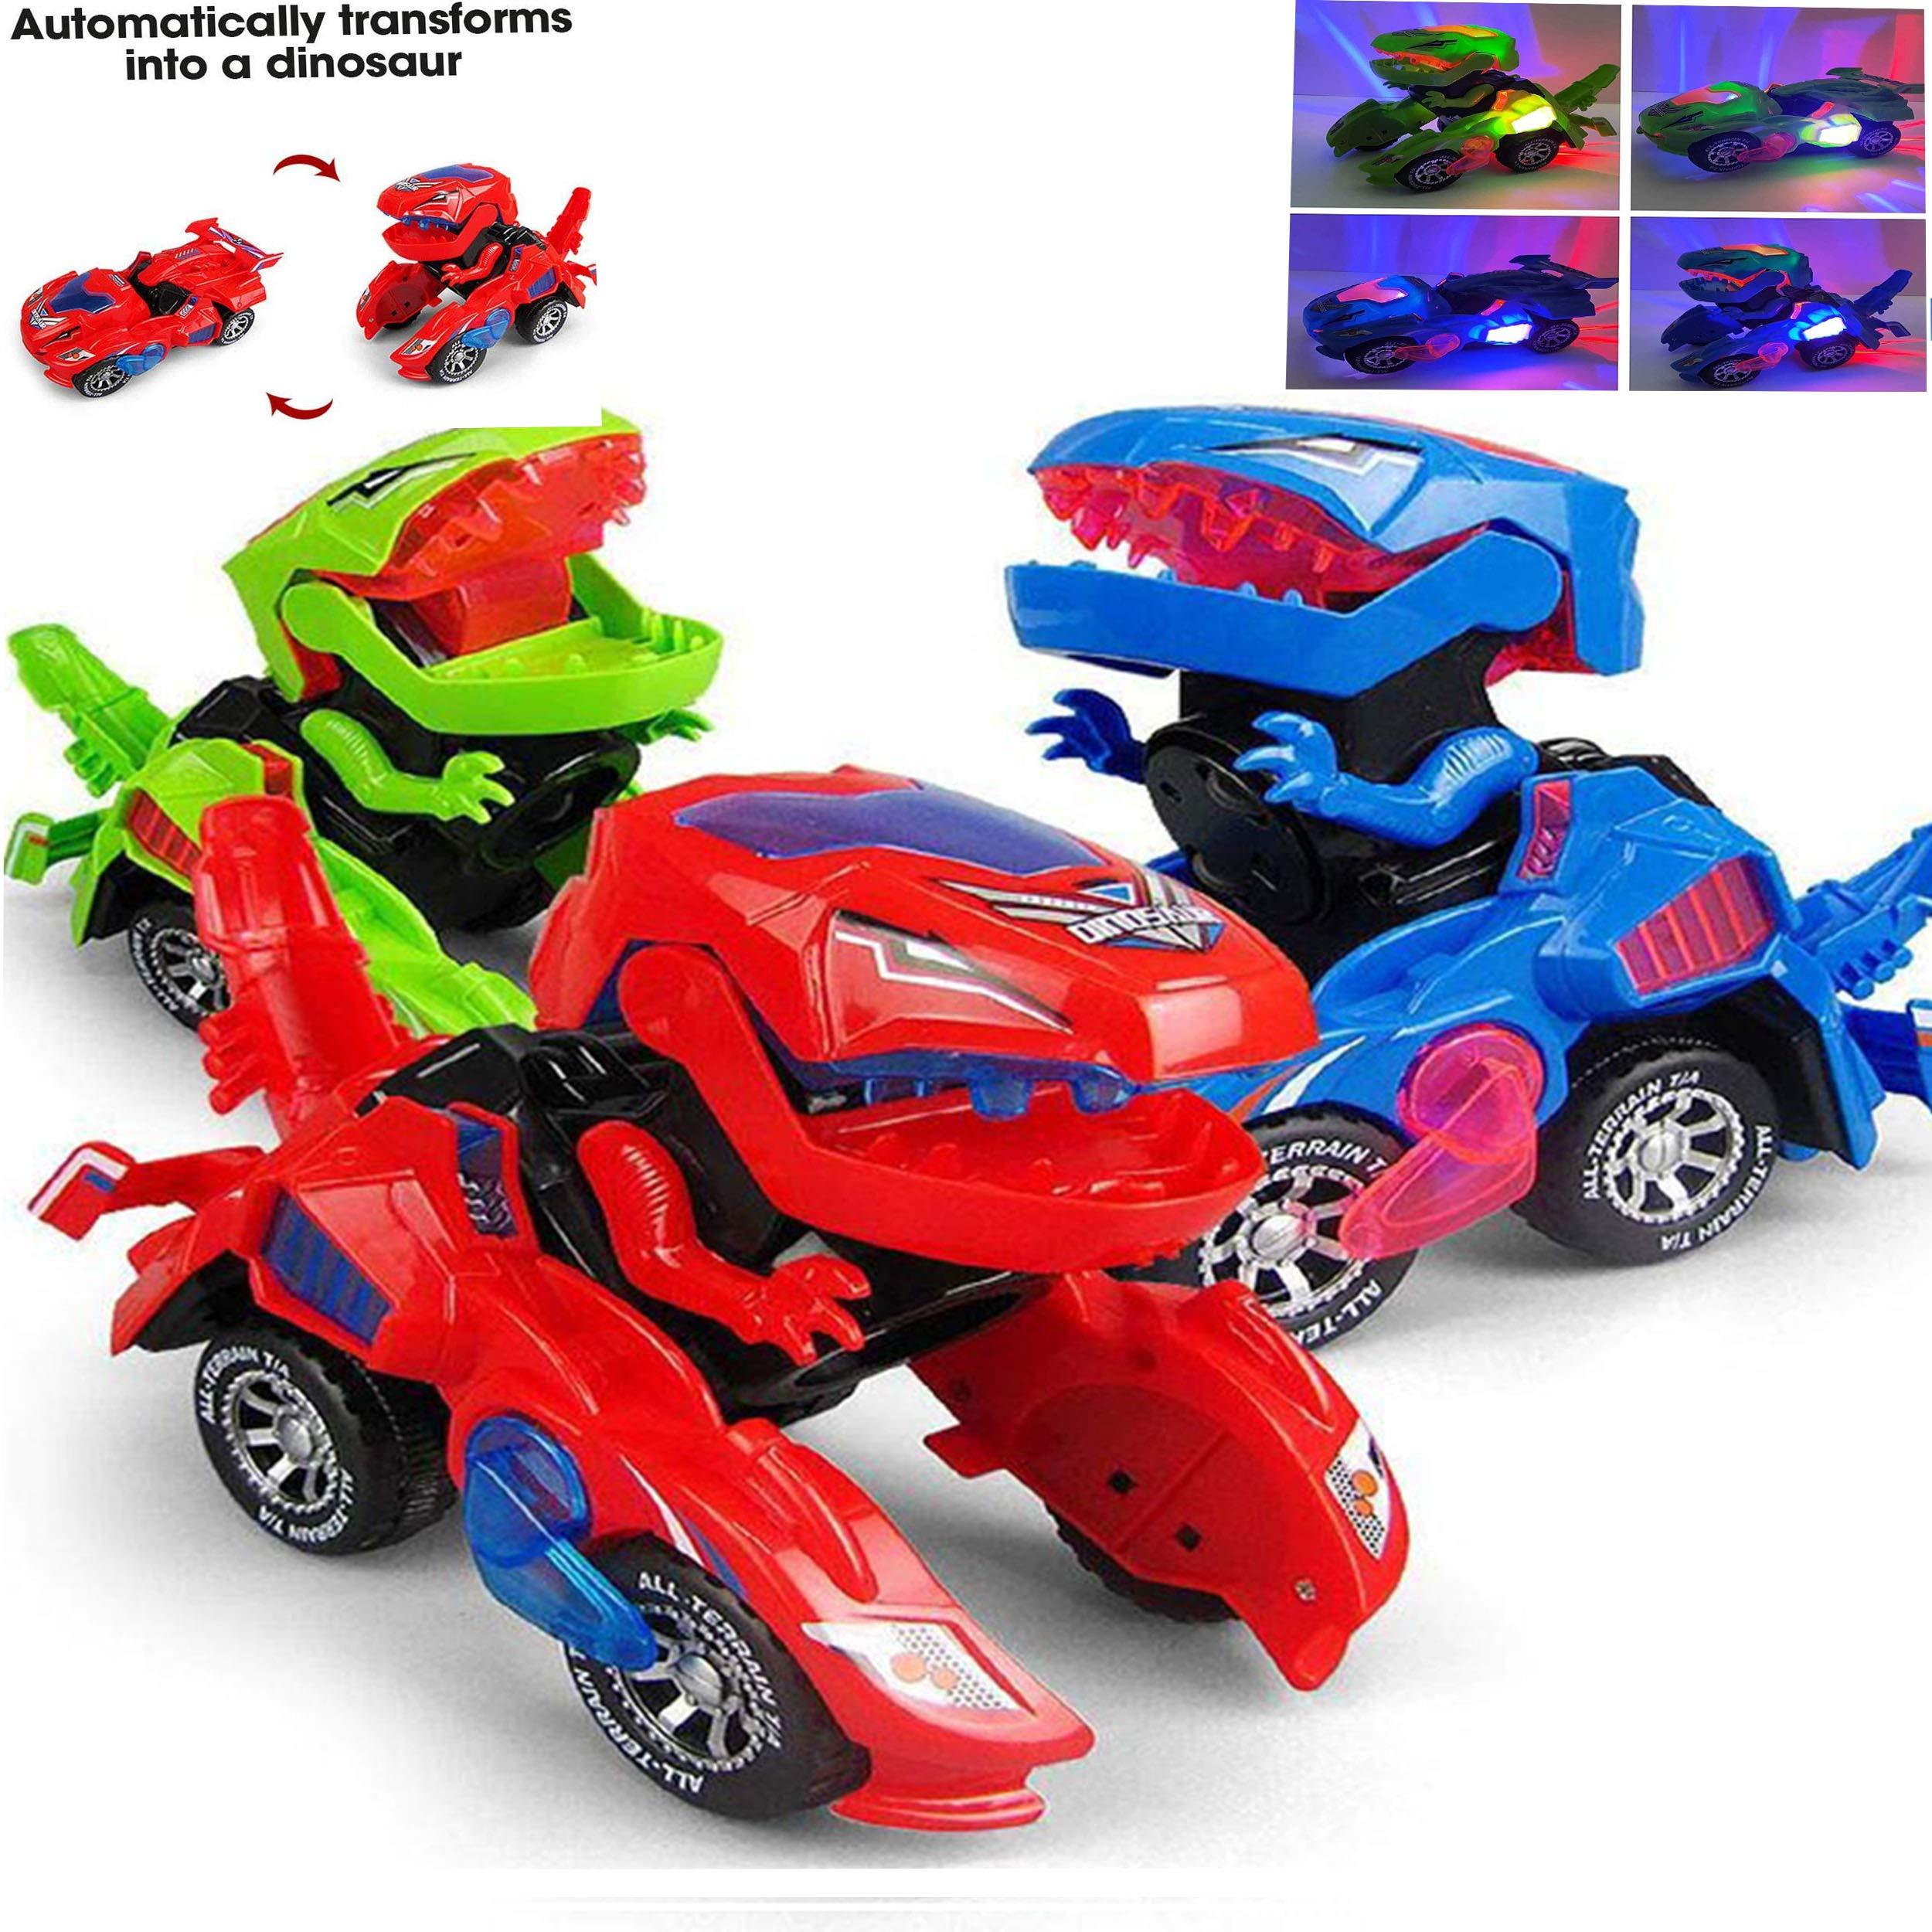 lonko5DING Transforming Dinosaur LED Car Dinosaur Transform Car Toy Automatic Dino Dinosaur Transformer Toy by lonko5DING